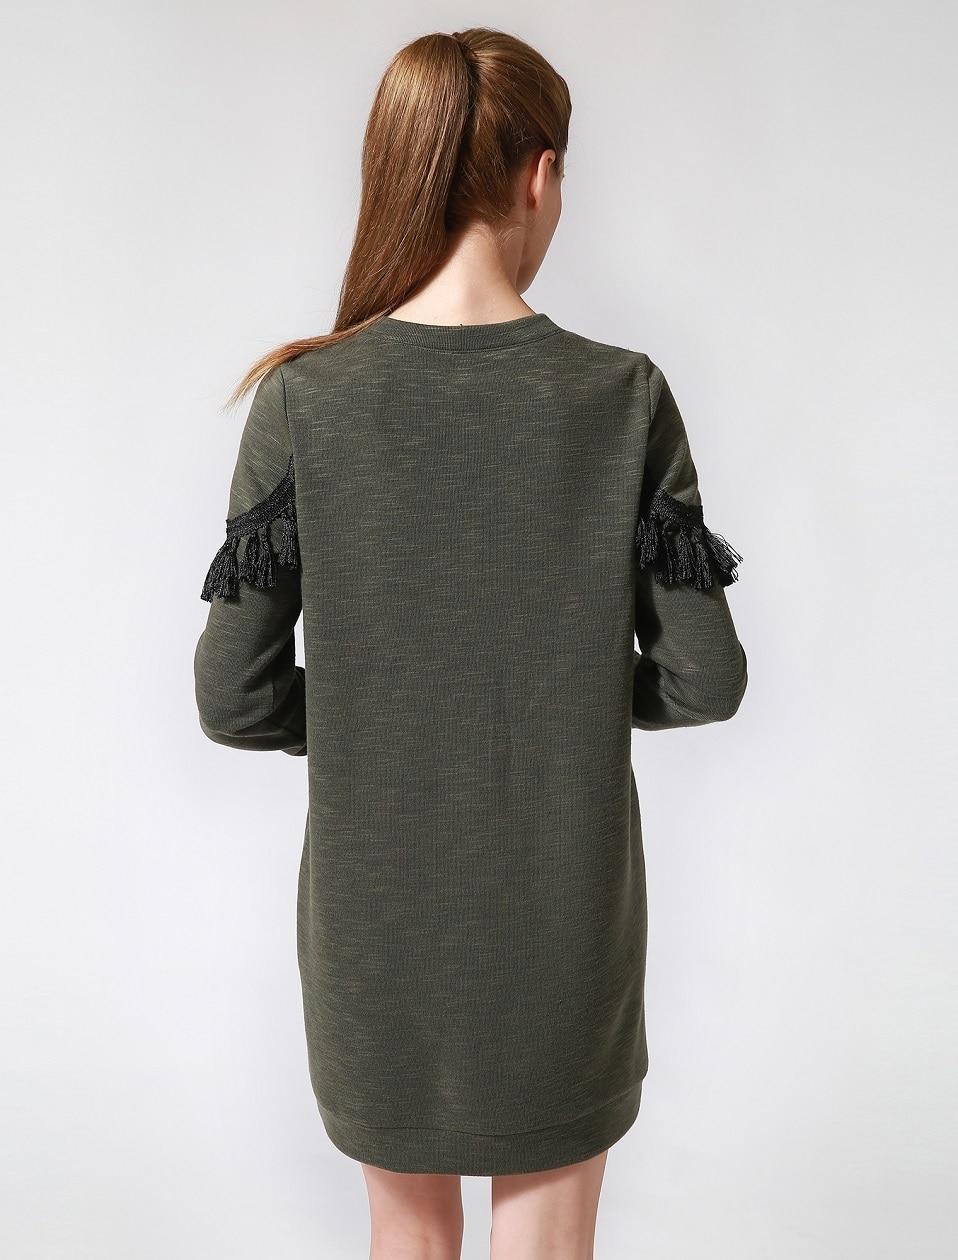 40b5e2f2b4df Once 3.28 Spring Women Mini Shirt Pullover Dress Army Green Tassel ...